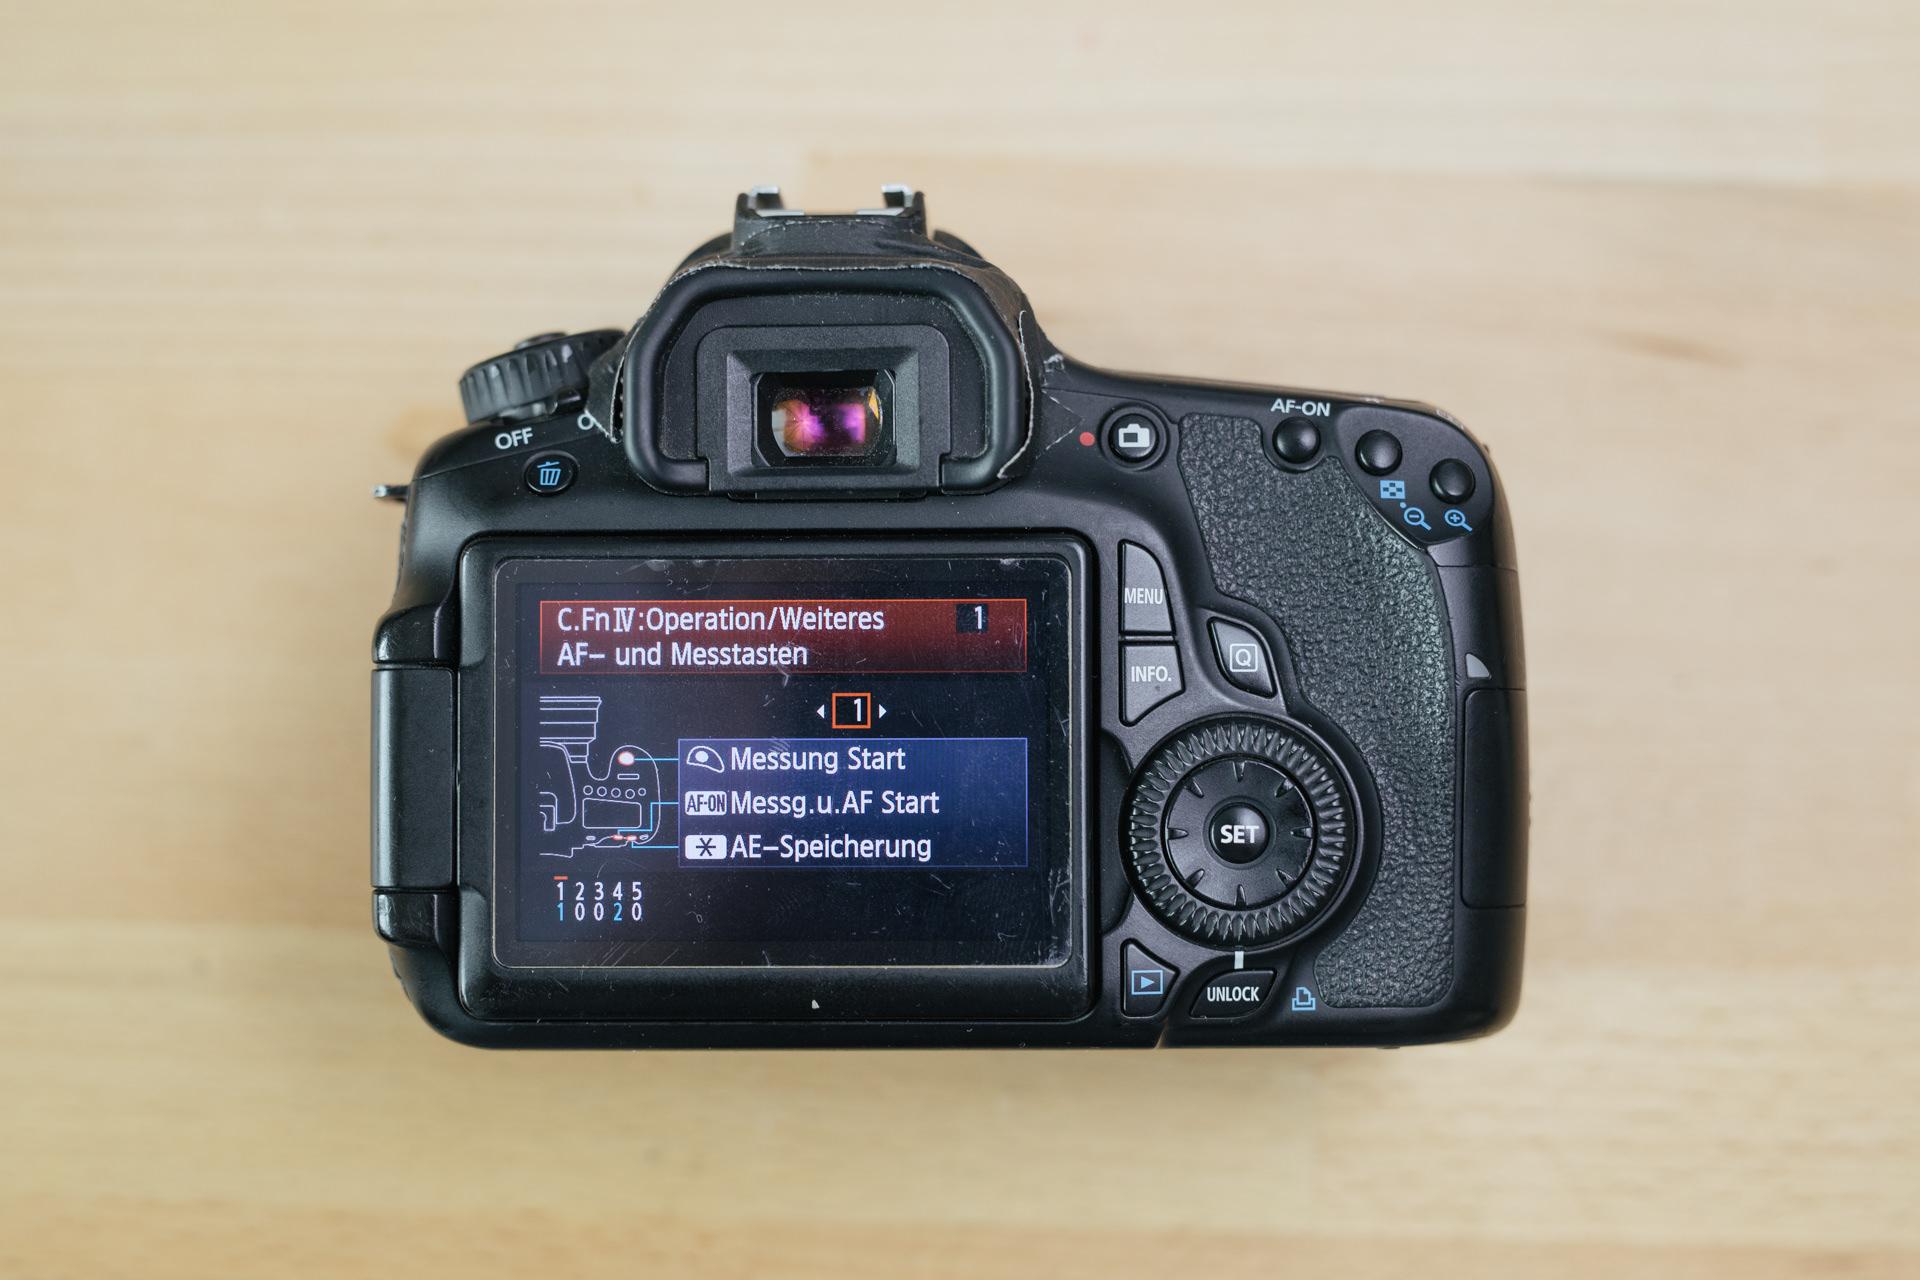 Back button Fokus bei Canon Kameras aktivieren